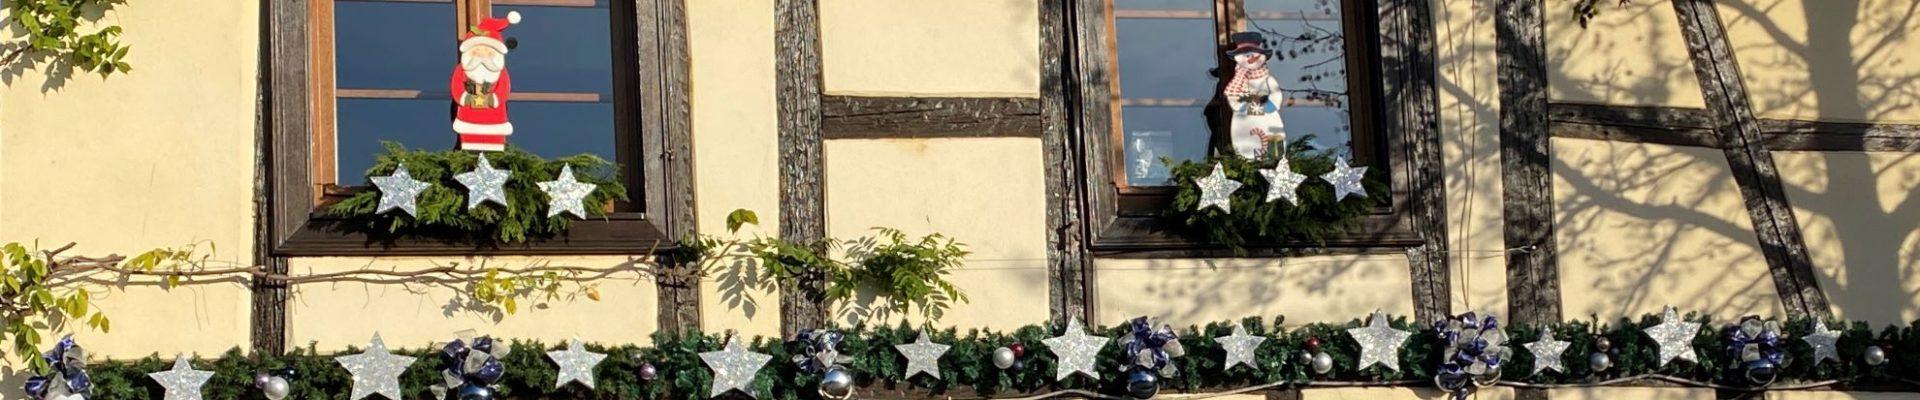 [Balade] Promenade confinée #3 – à l'approche de Noël